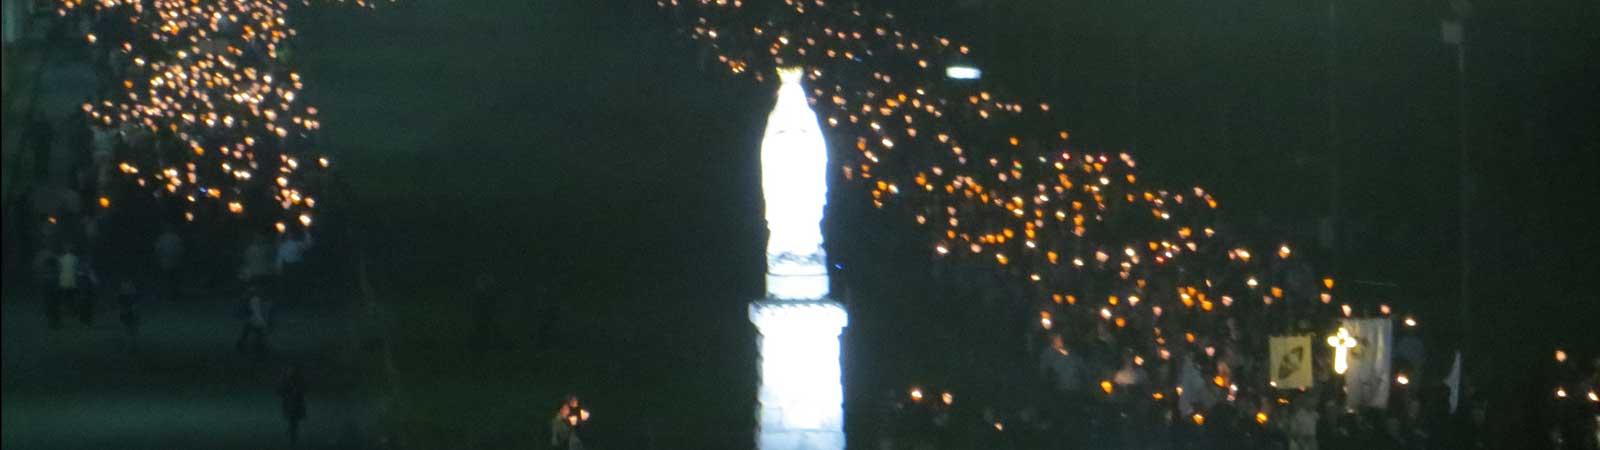 A-Lourdes-in-pellegrinaggio-139